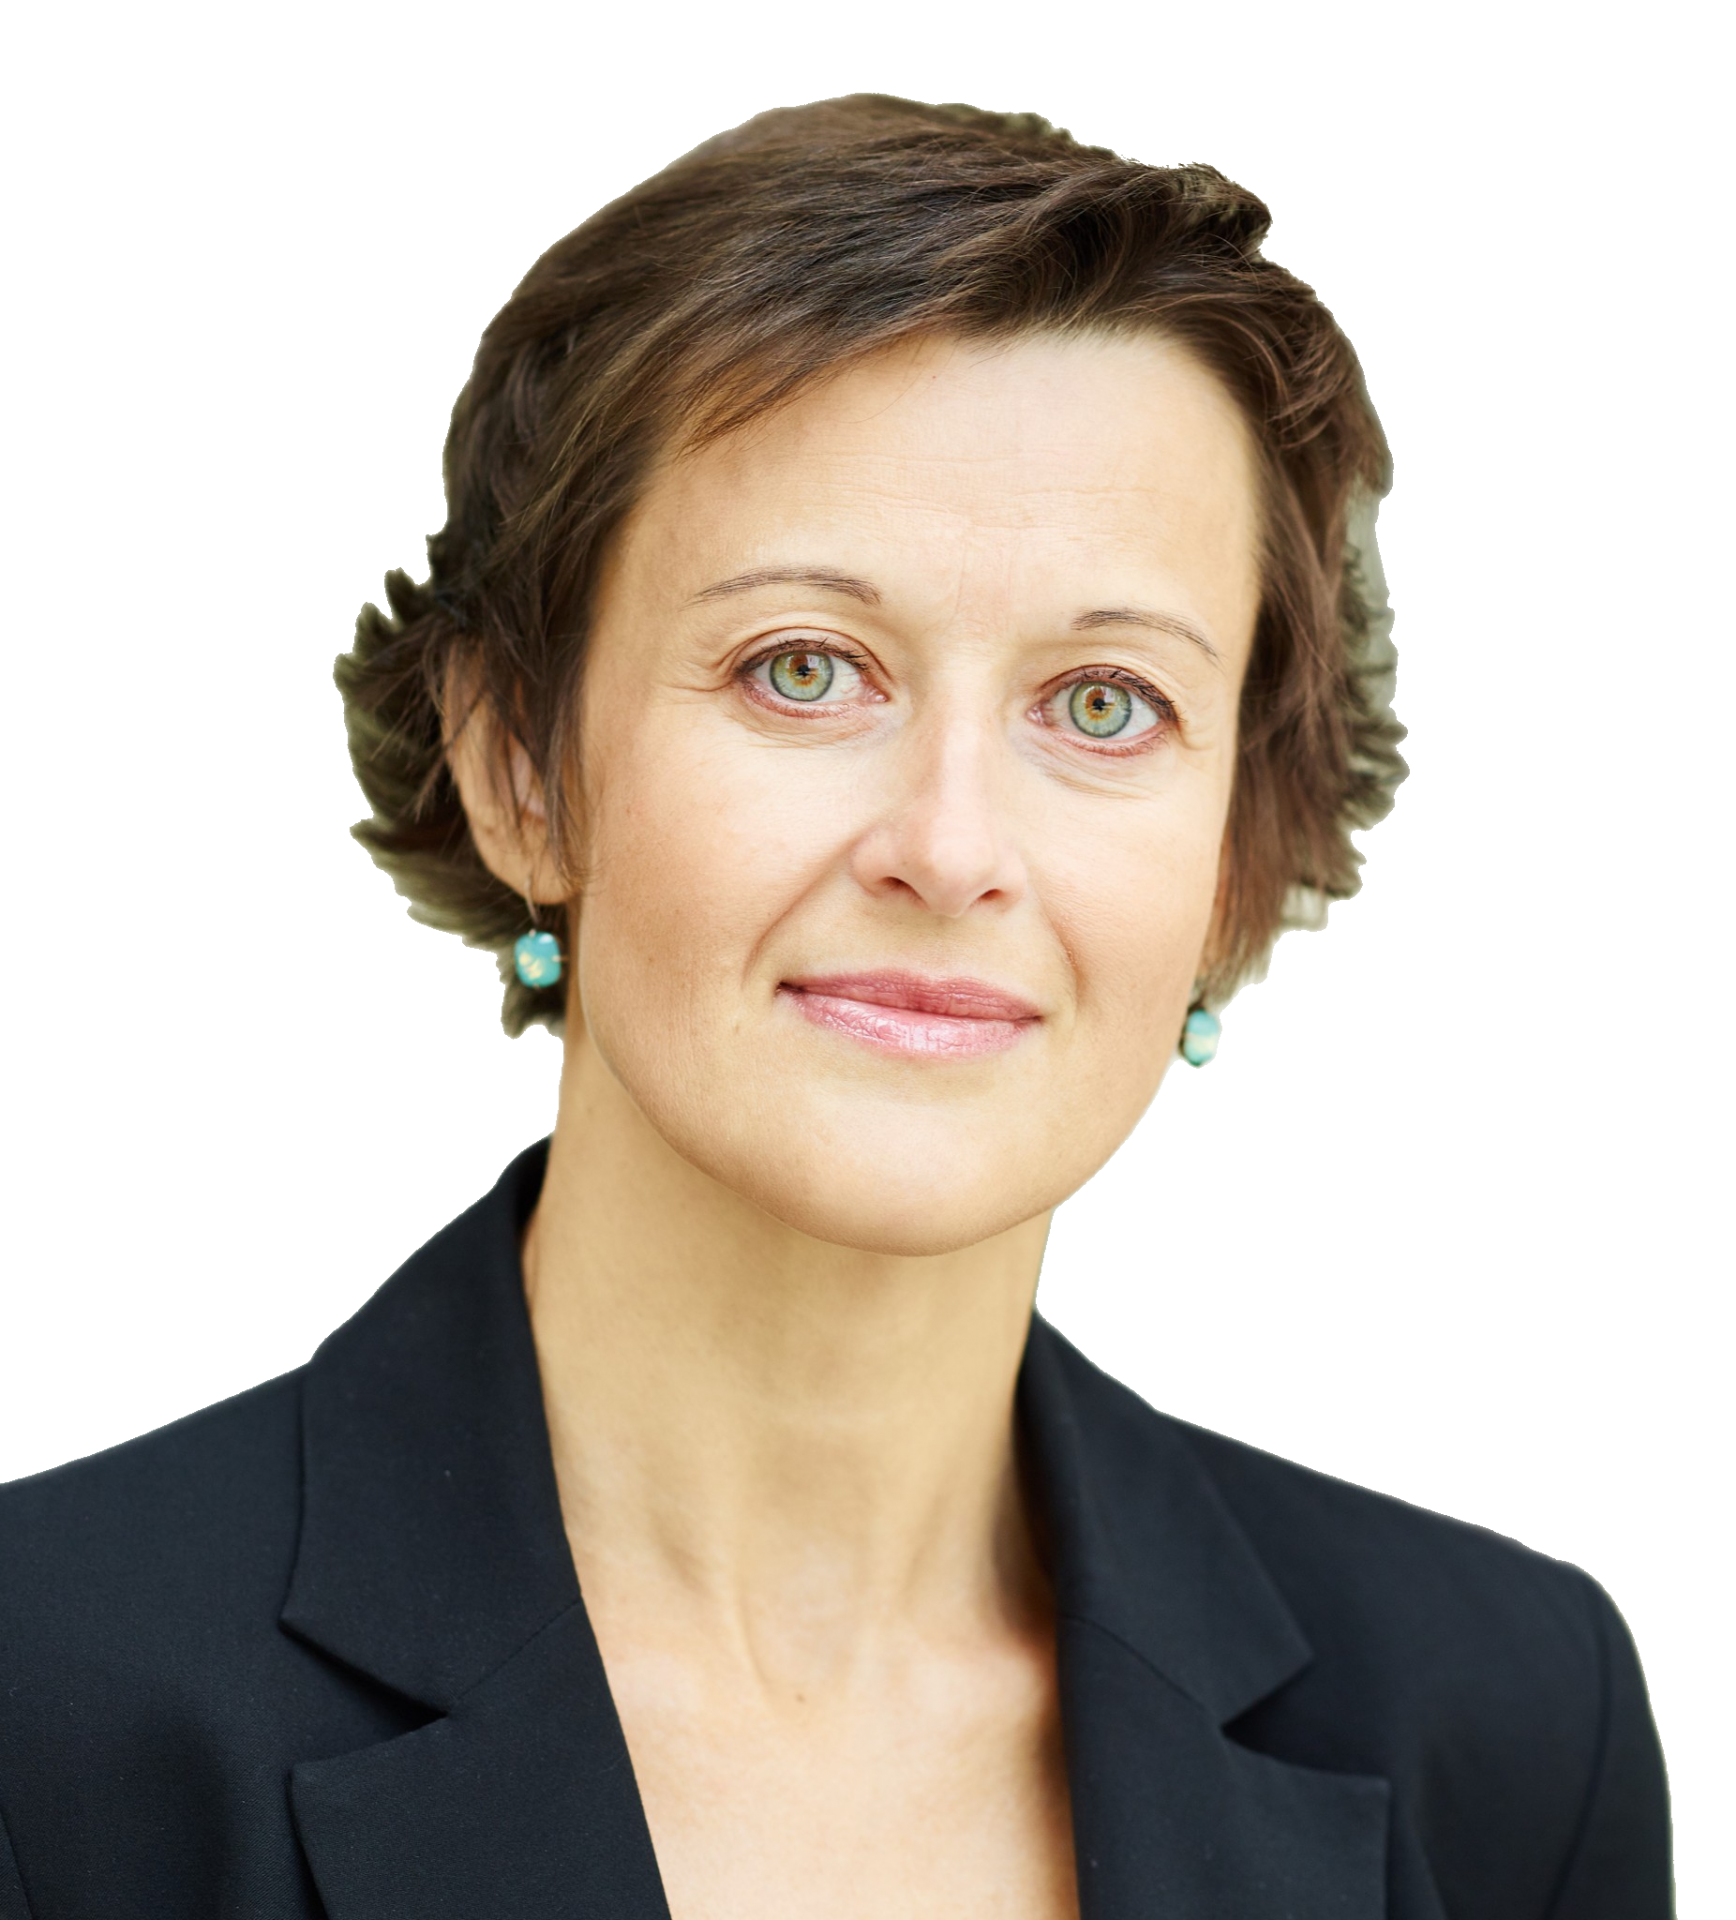 Color Portrait of Aoife Kearns, Chief Human Resources Officer | MPK International | Dublin, Ireland